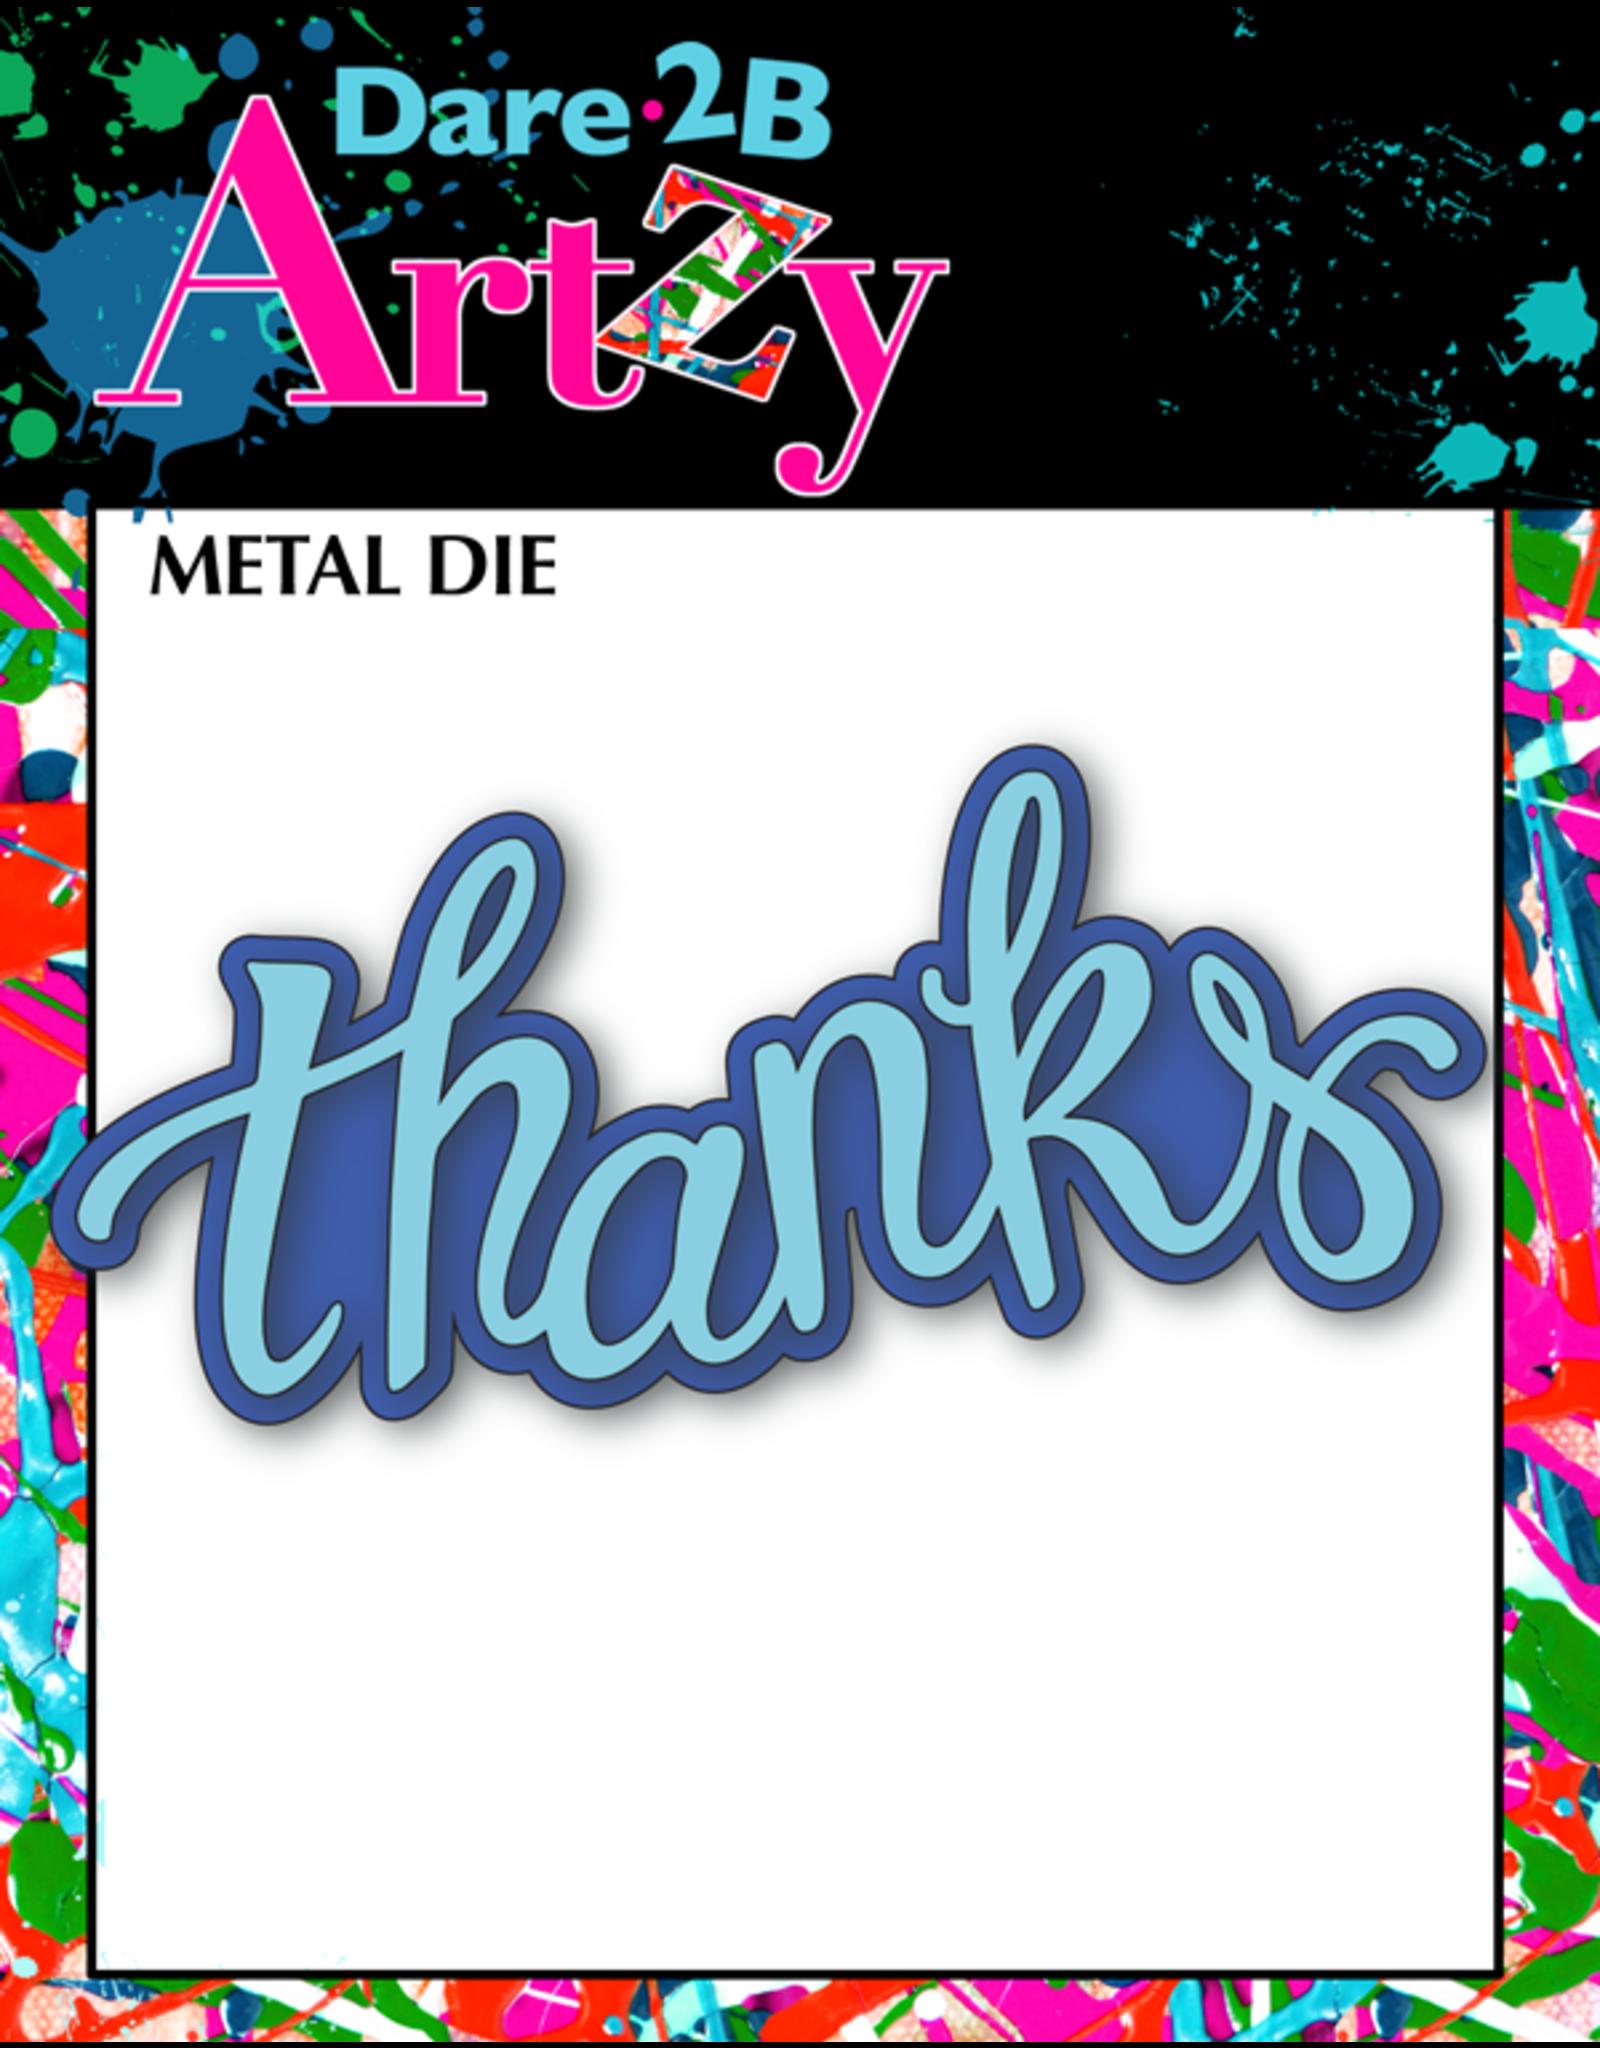 Dare 2B Artzy Thanks Layer - Die